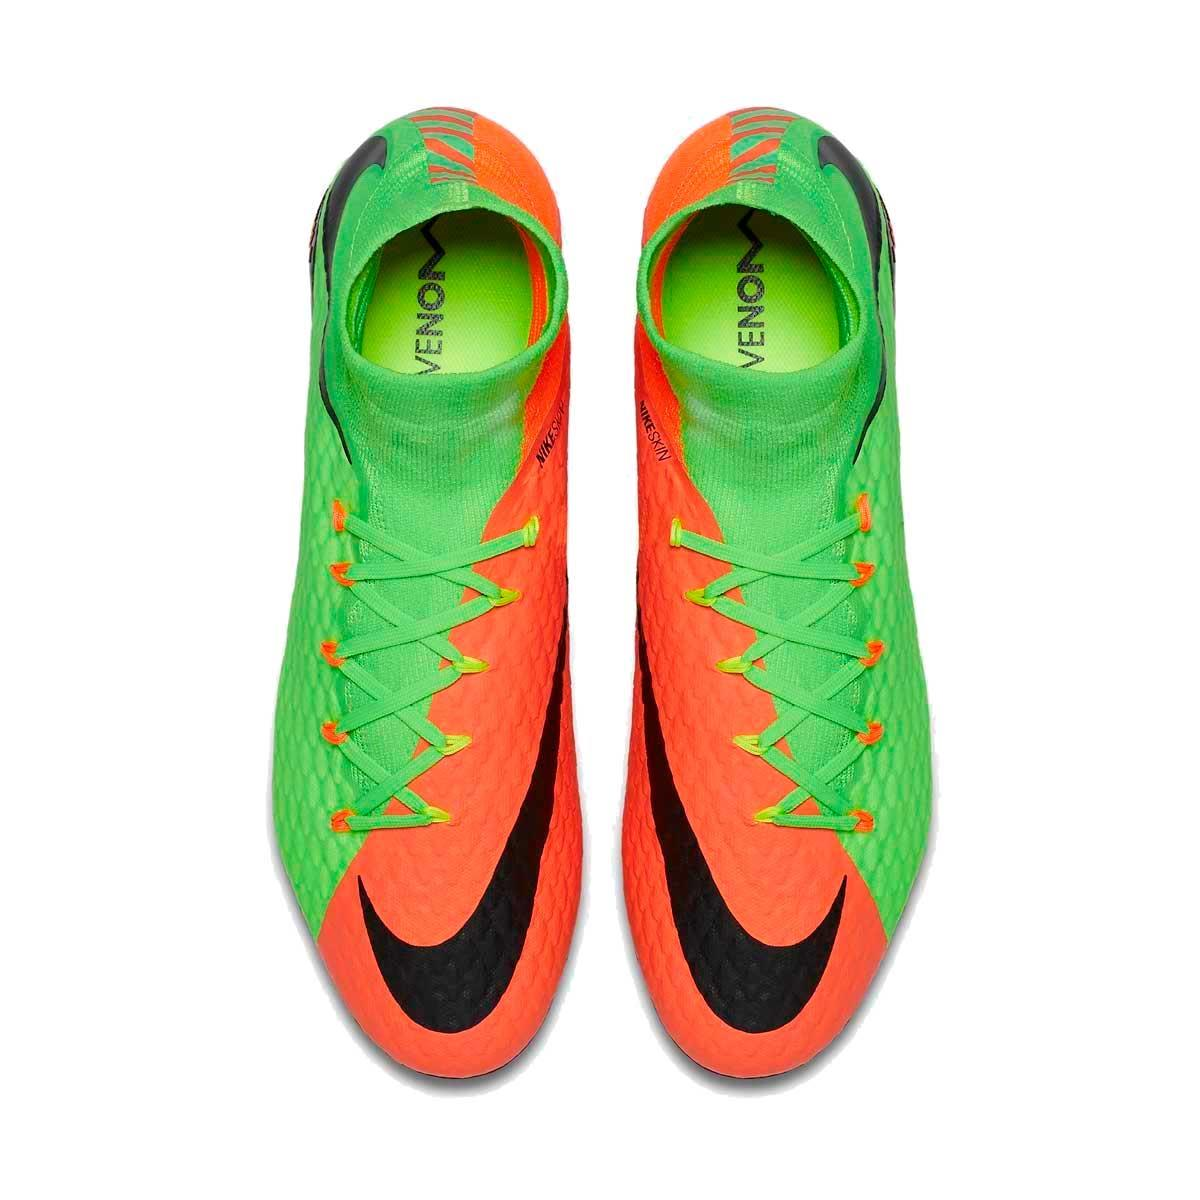 d1f6930d3 Chuteira Campo Nike Hypervenom Phatal III